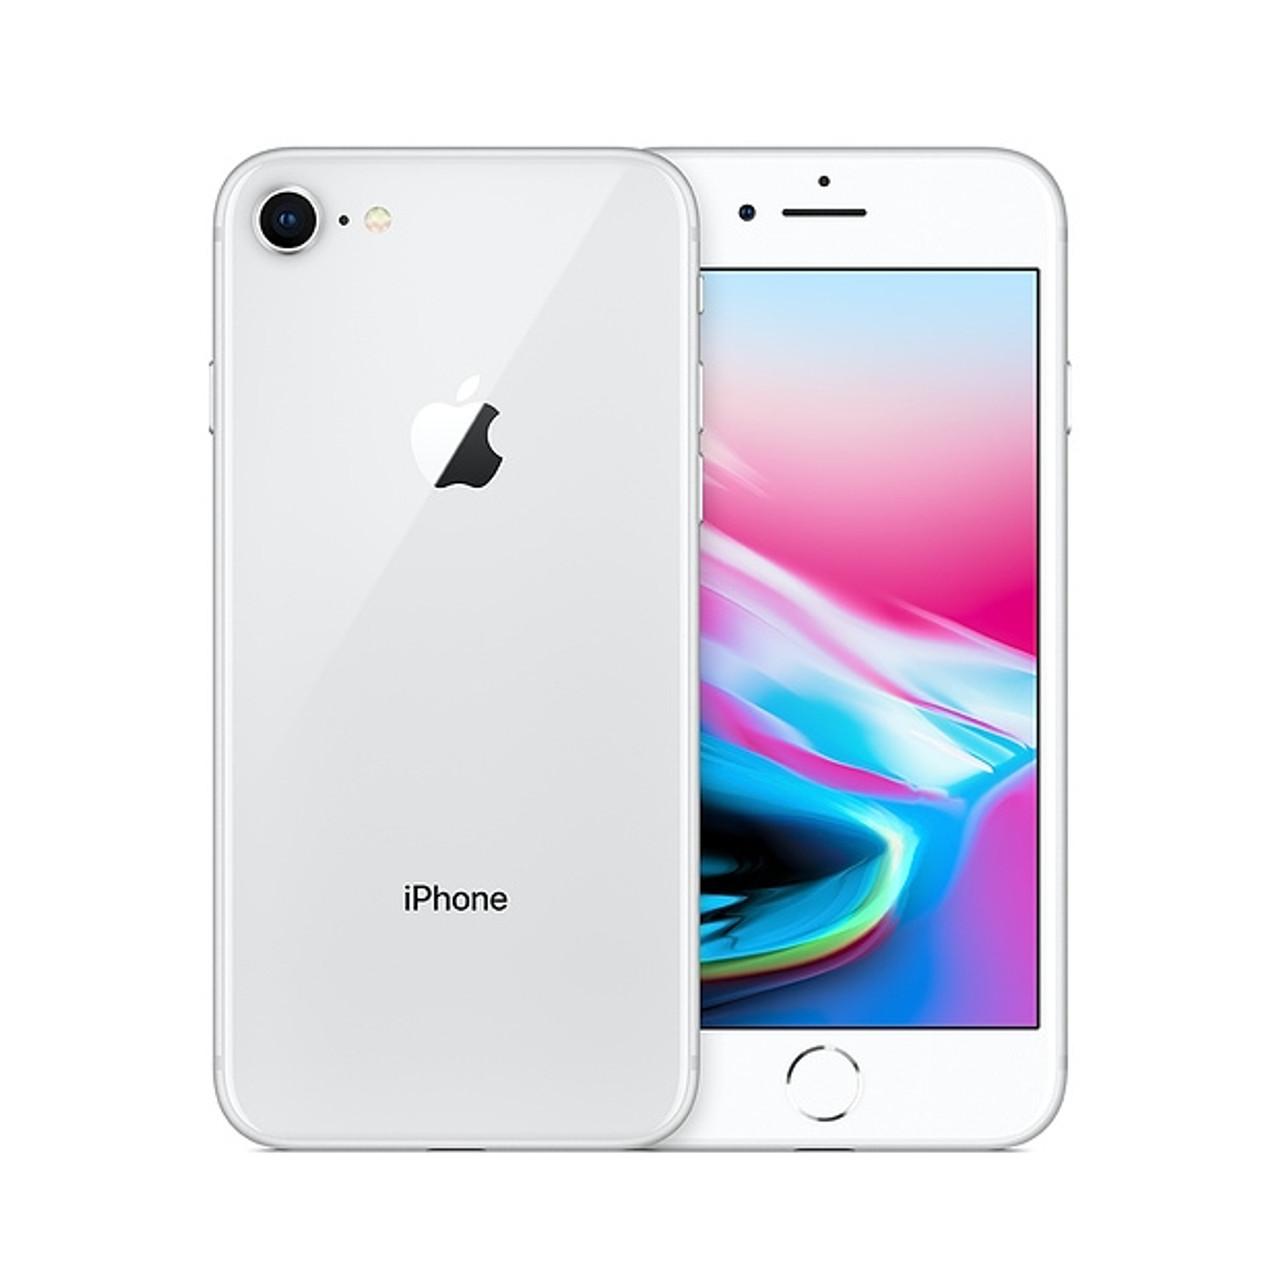 563e5deacf3 Apple iPhone 8 (Unlocked) 64GB - Silver MQ6W2LL A (Factory Sealed ...